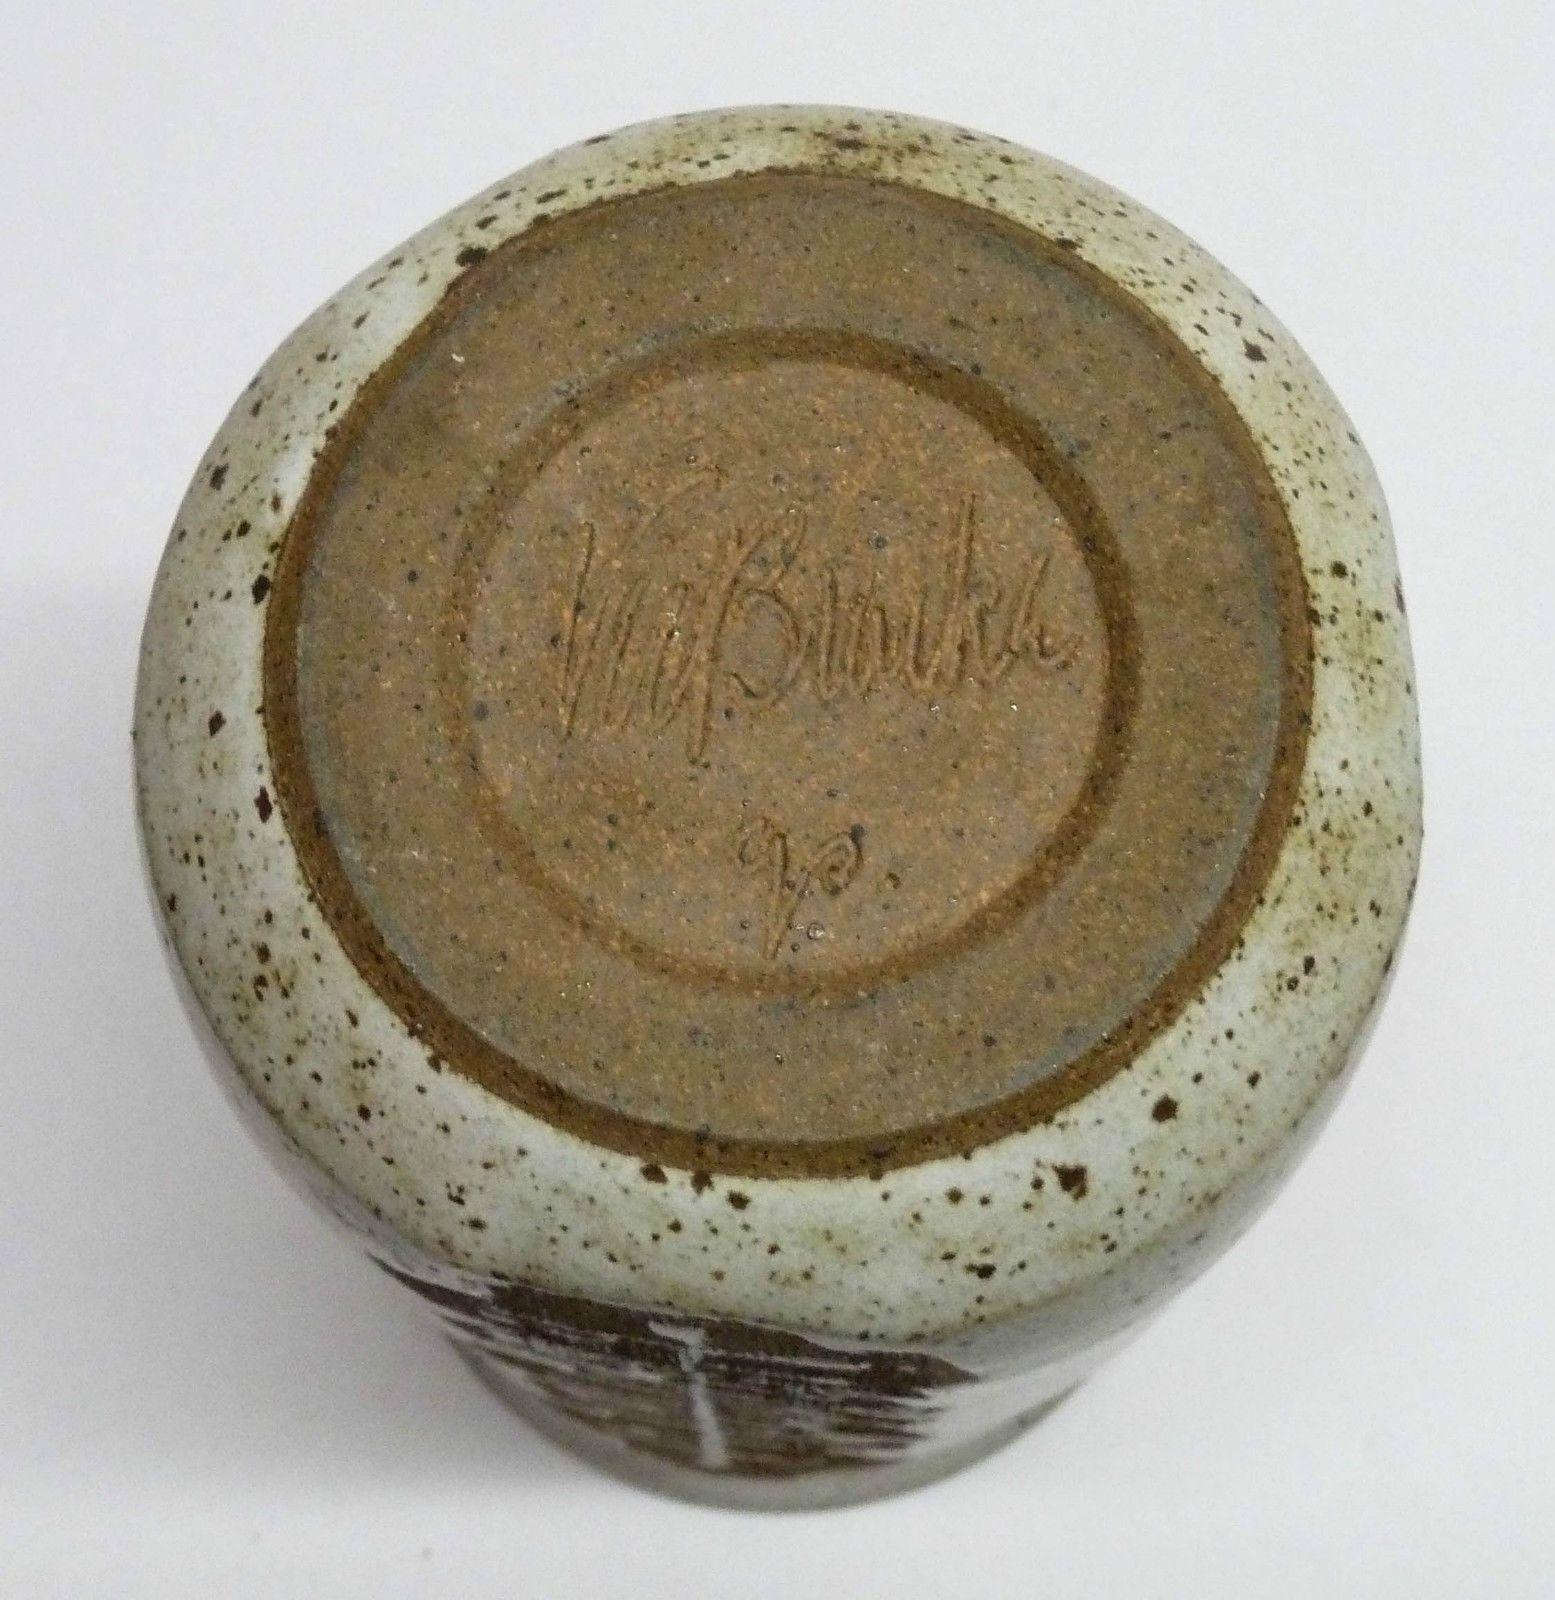 Vintage victor bracke studio pottery modernist vase california vintage victor bracke studio pottery modernist vase california northwest reviewsmspy